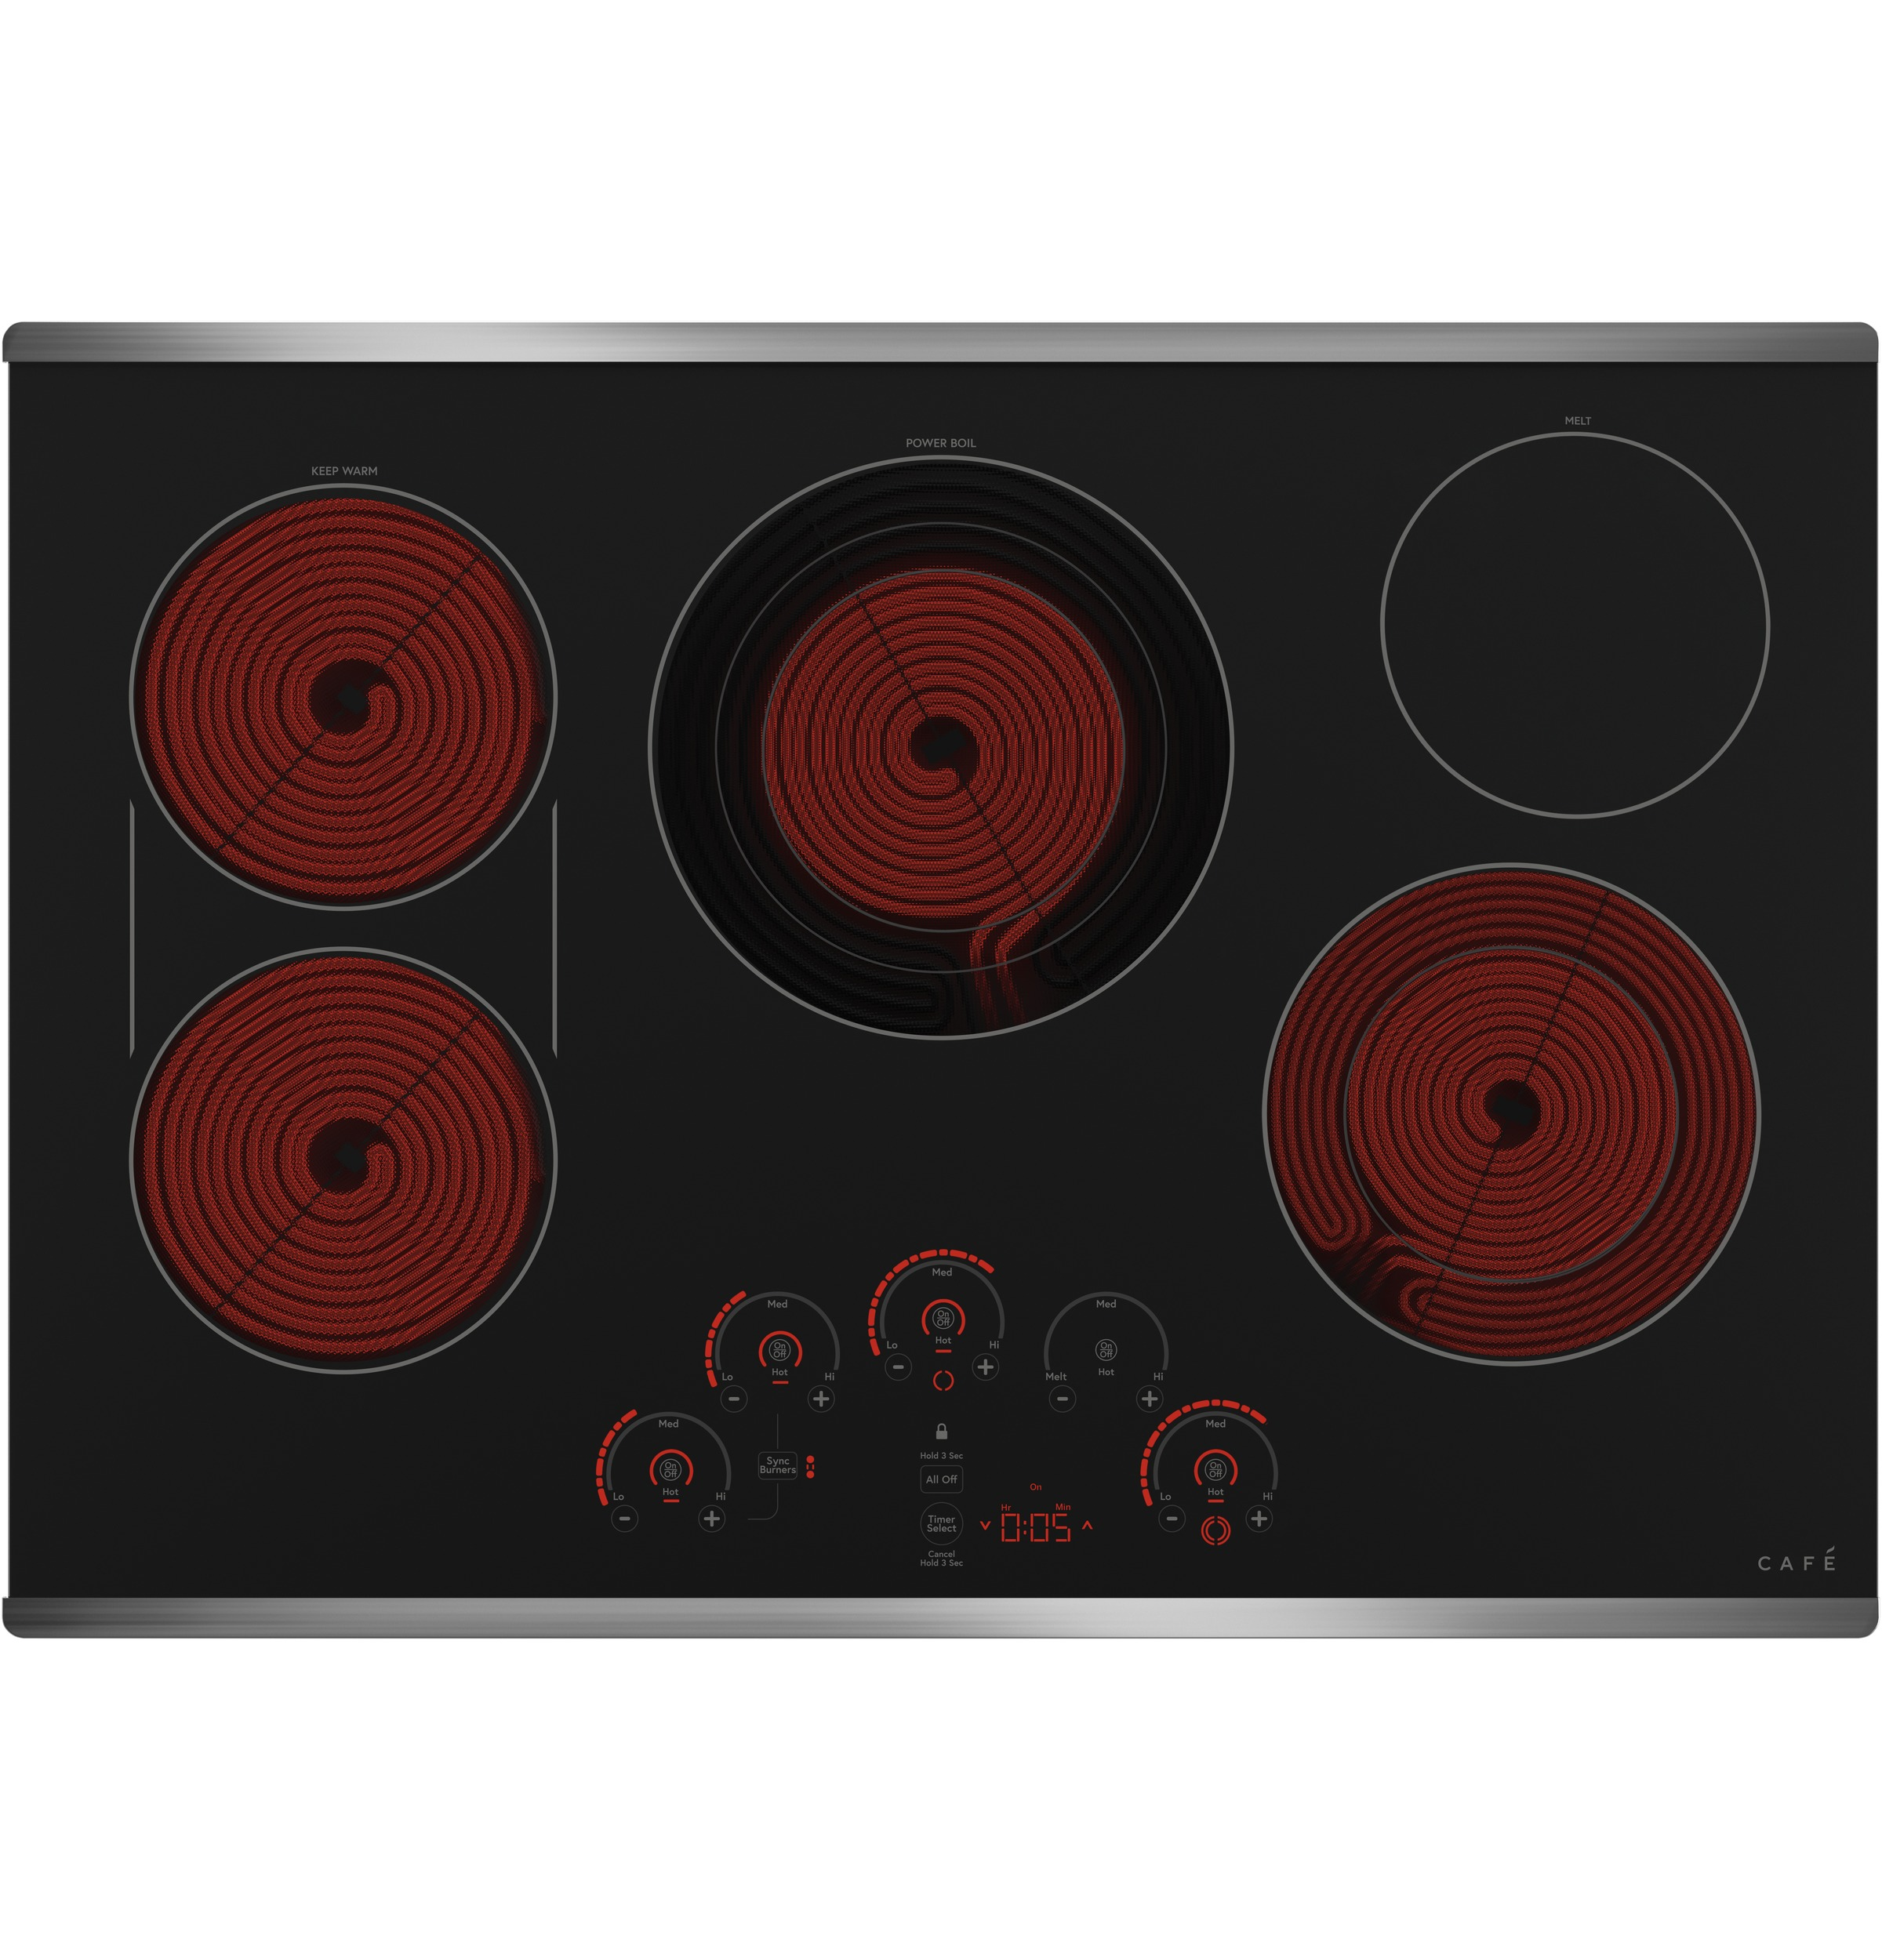 "Model: CEP90302NSS | Cafe Café™ 30"" Touch-Control Electric Cooktop"